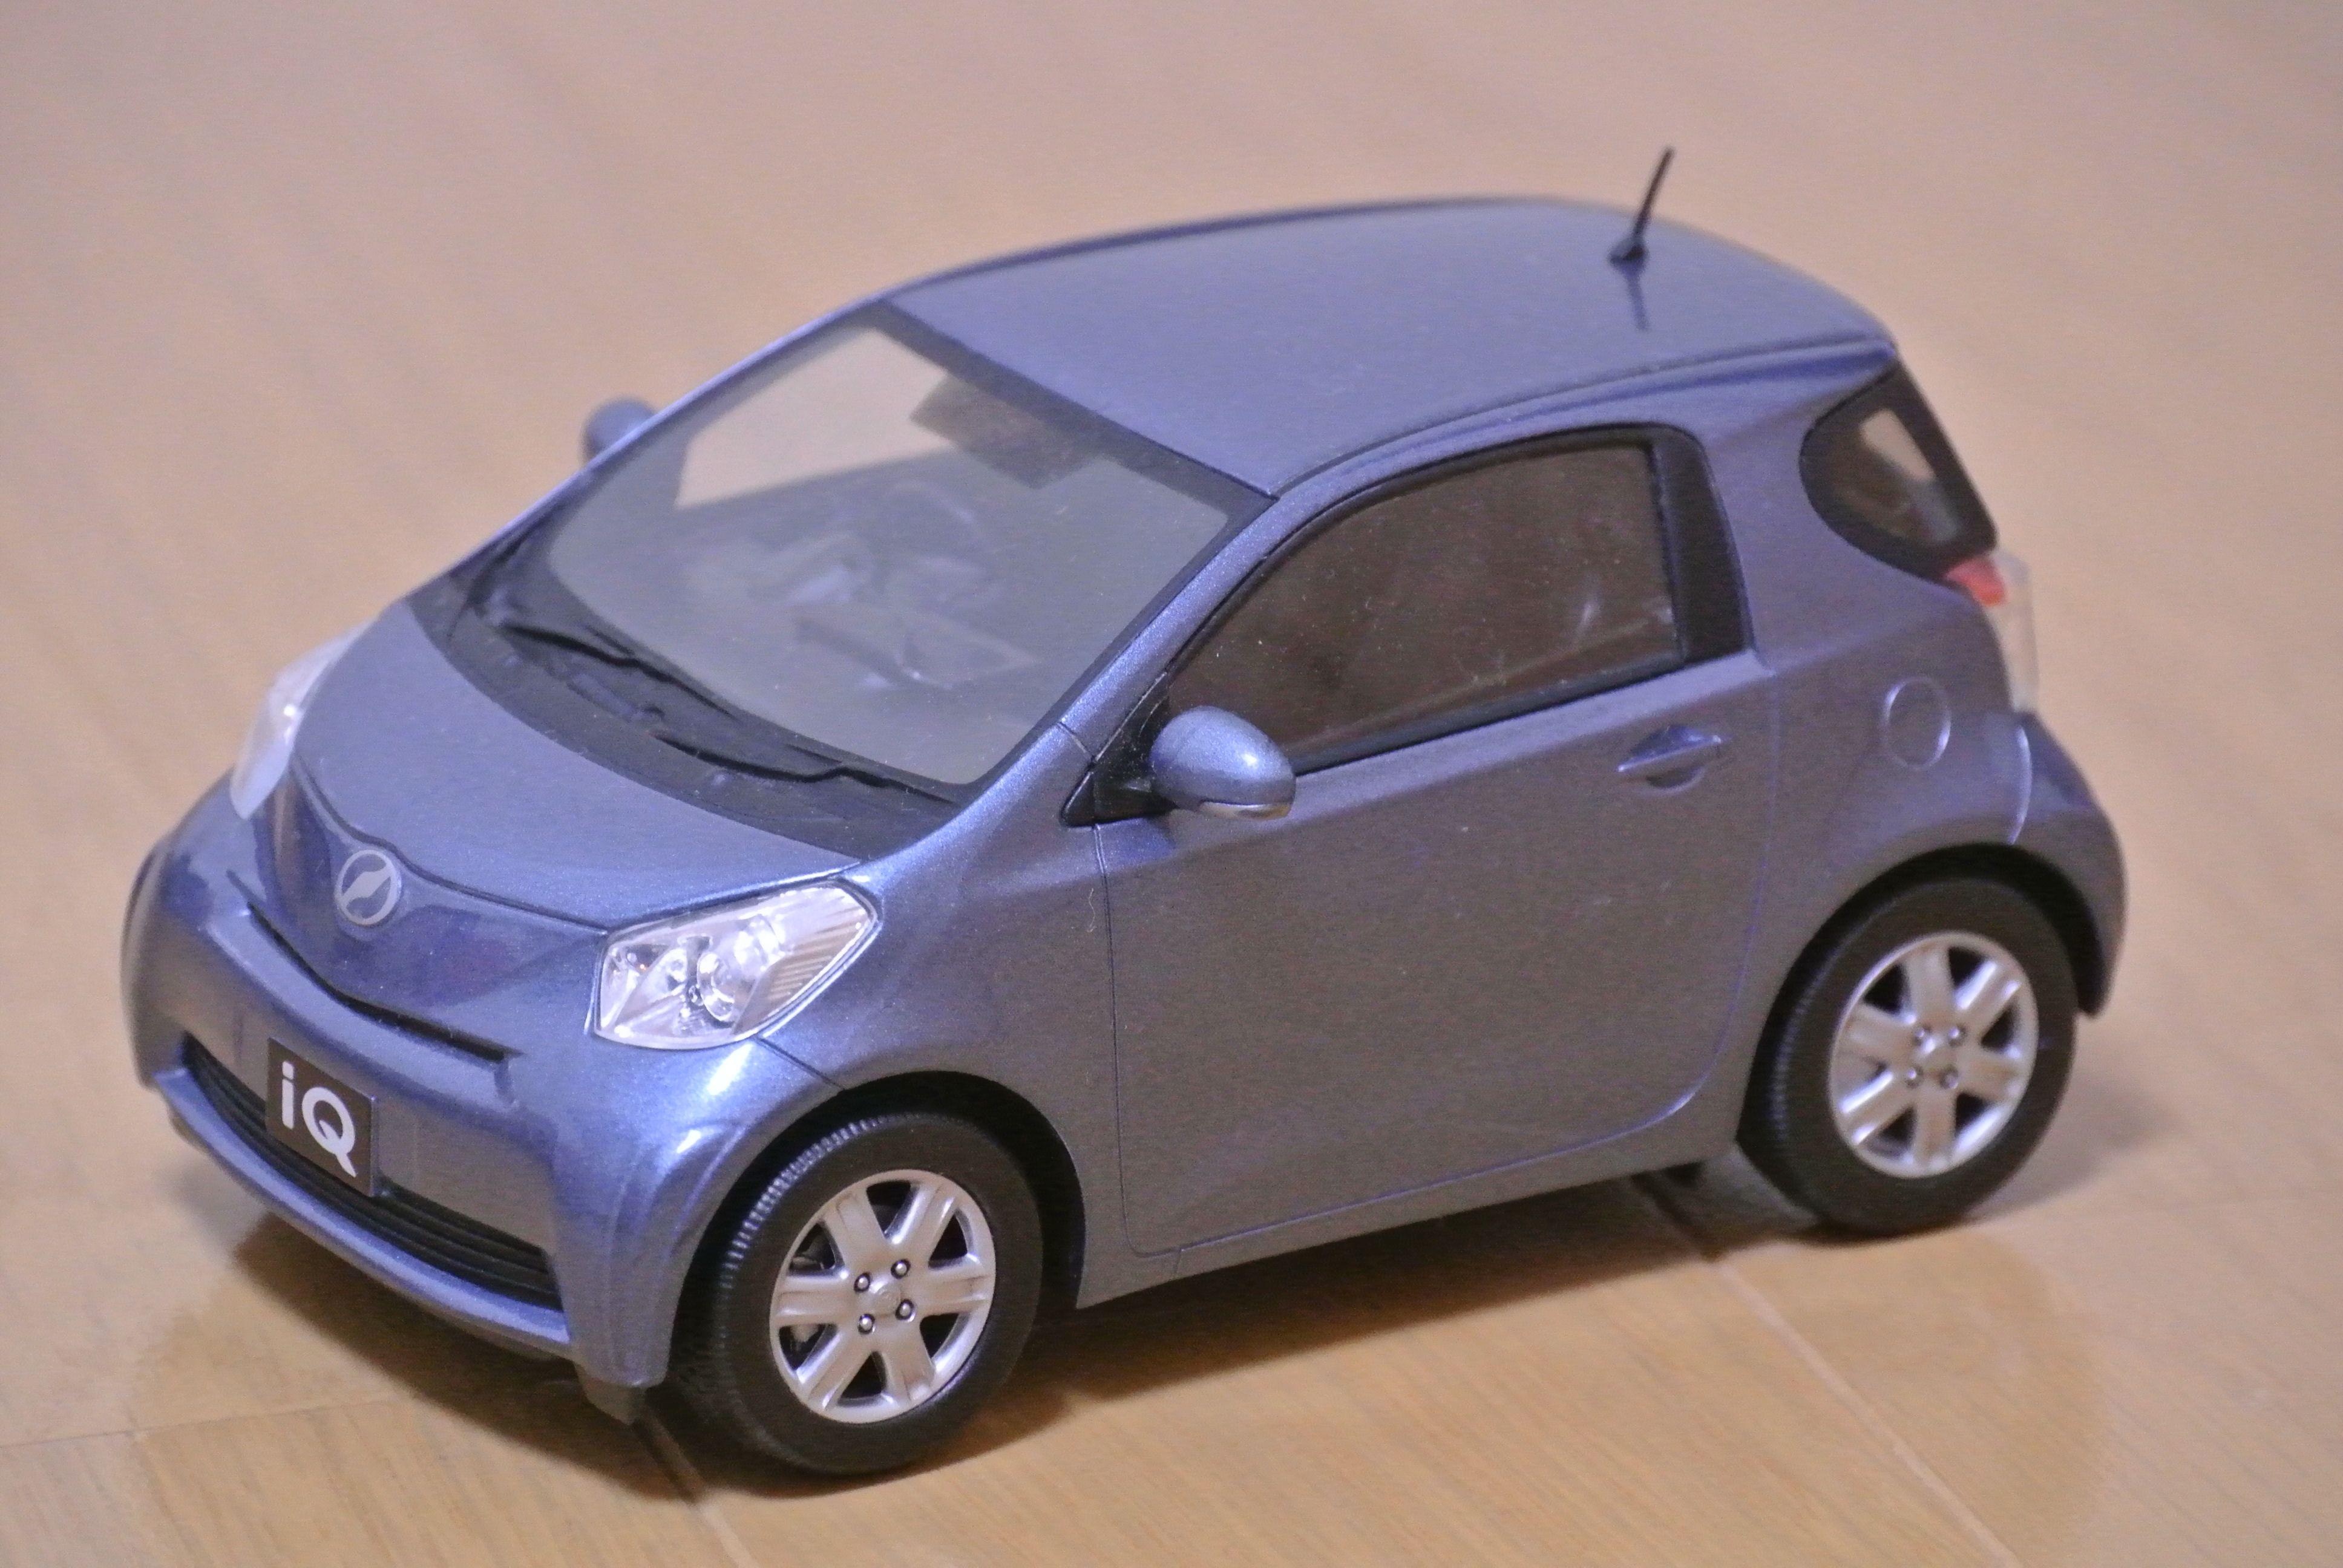 1 24 Toyota Iq Small Cars Toy Car Suv